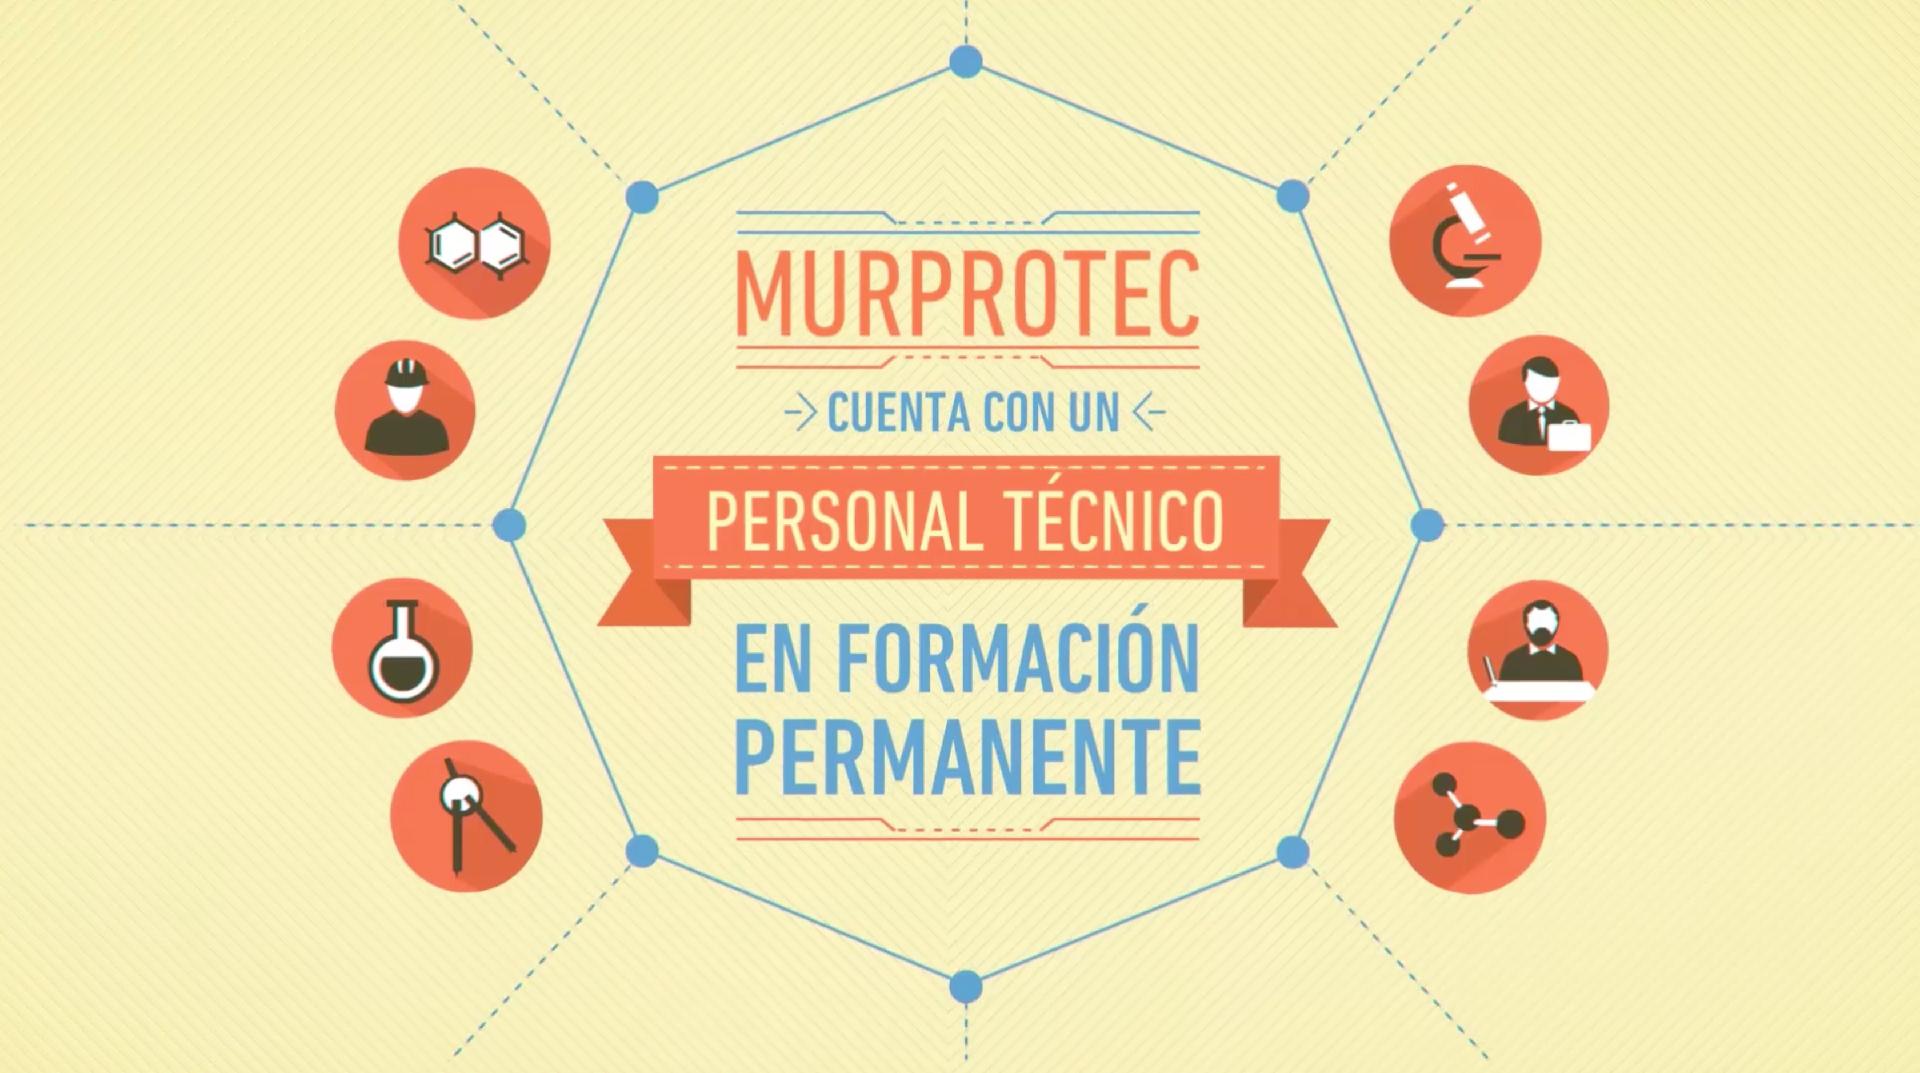 murprotec_personaltecnico